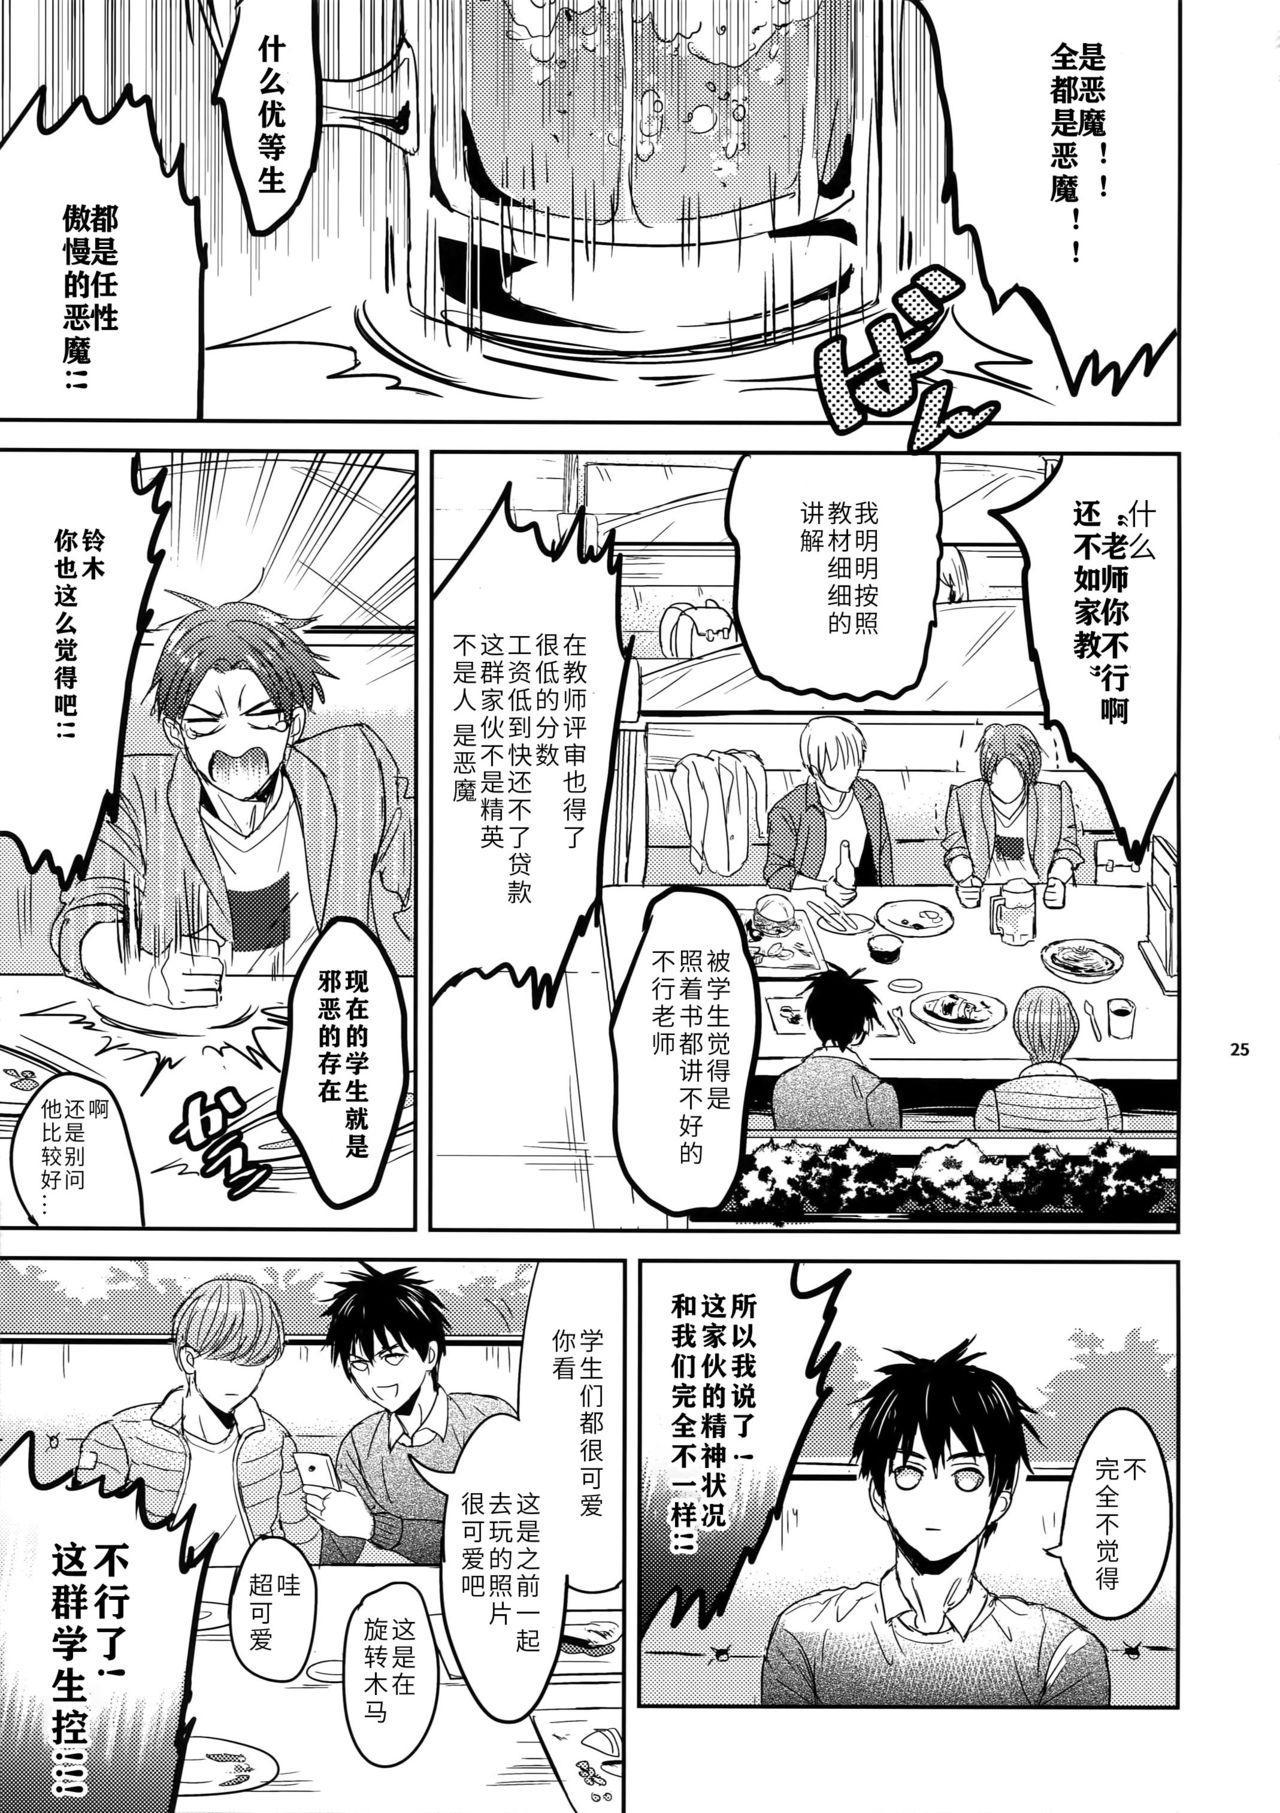 Sensei wa Nekketsu ga Areba Juubunda! | 老师只要热血就够了! 24